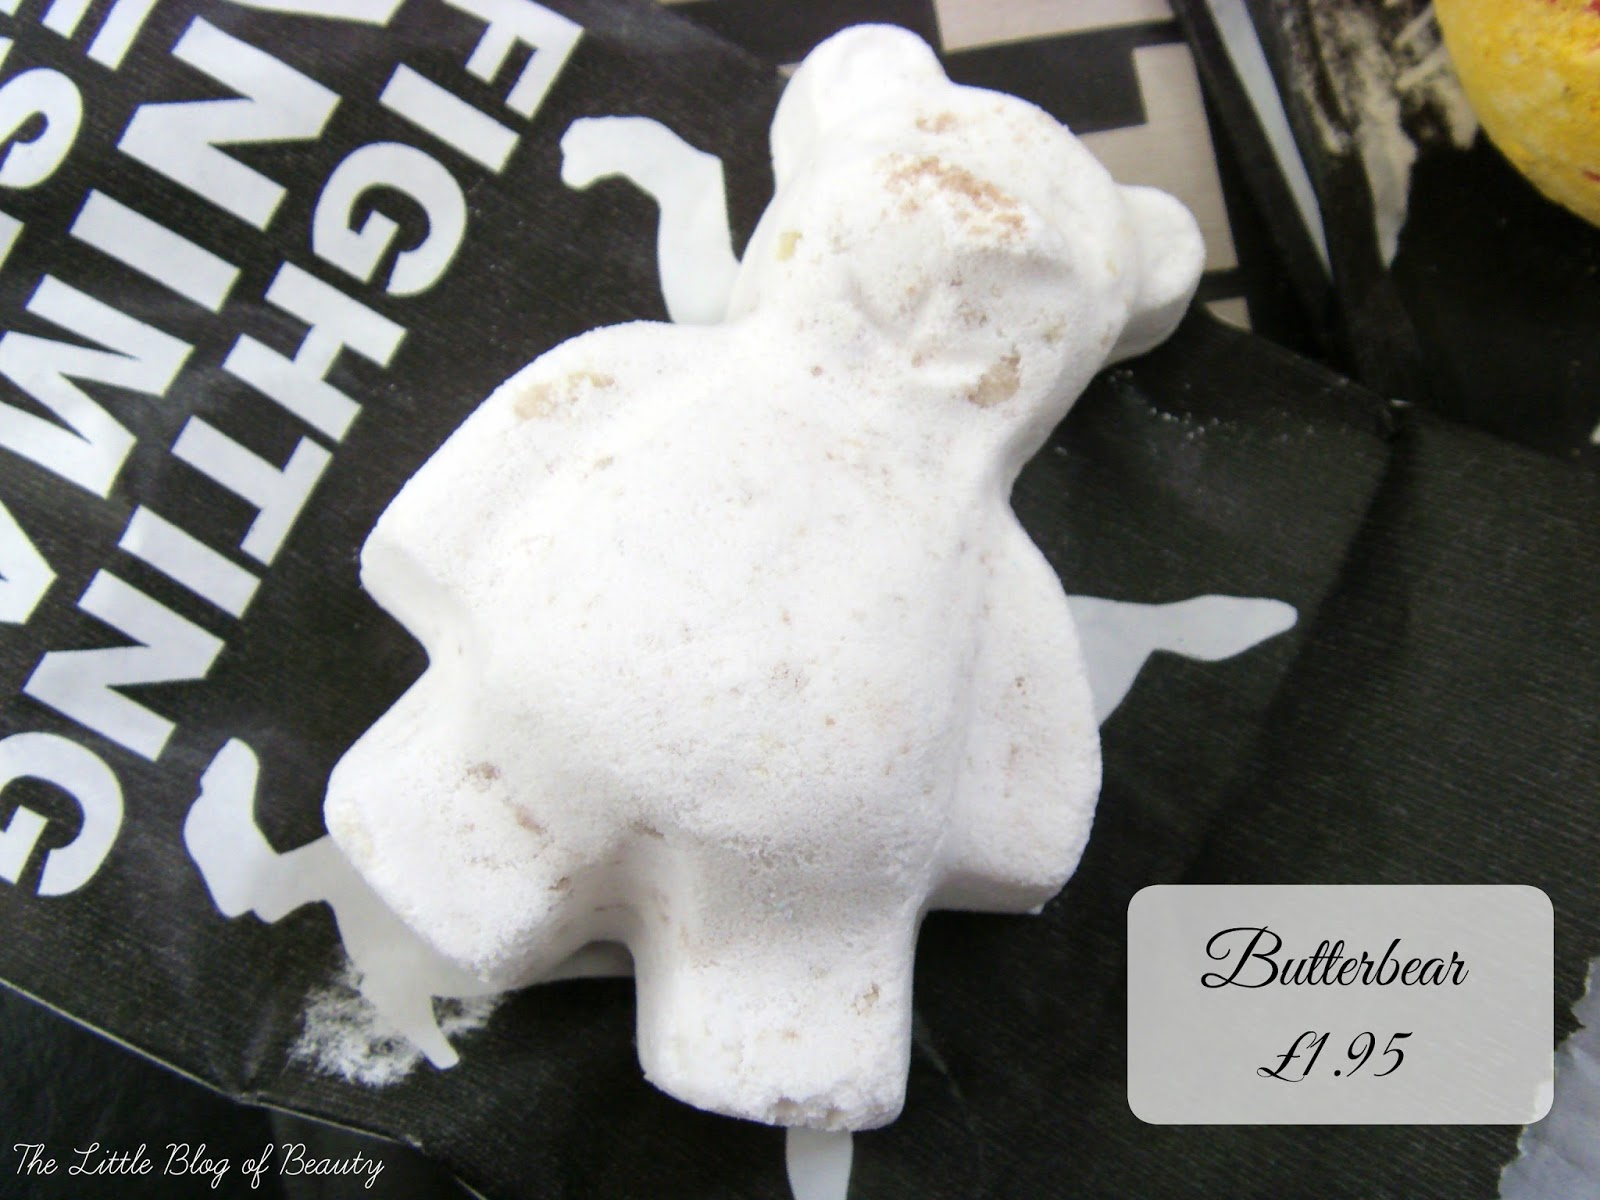 Lush Butterbear bath bomb